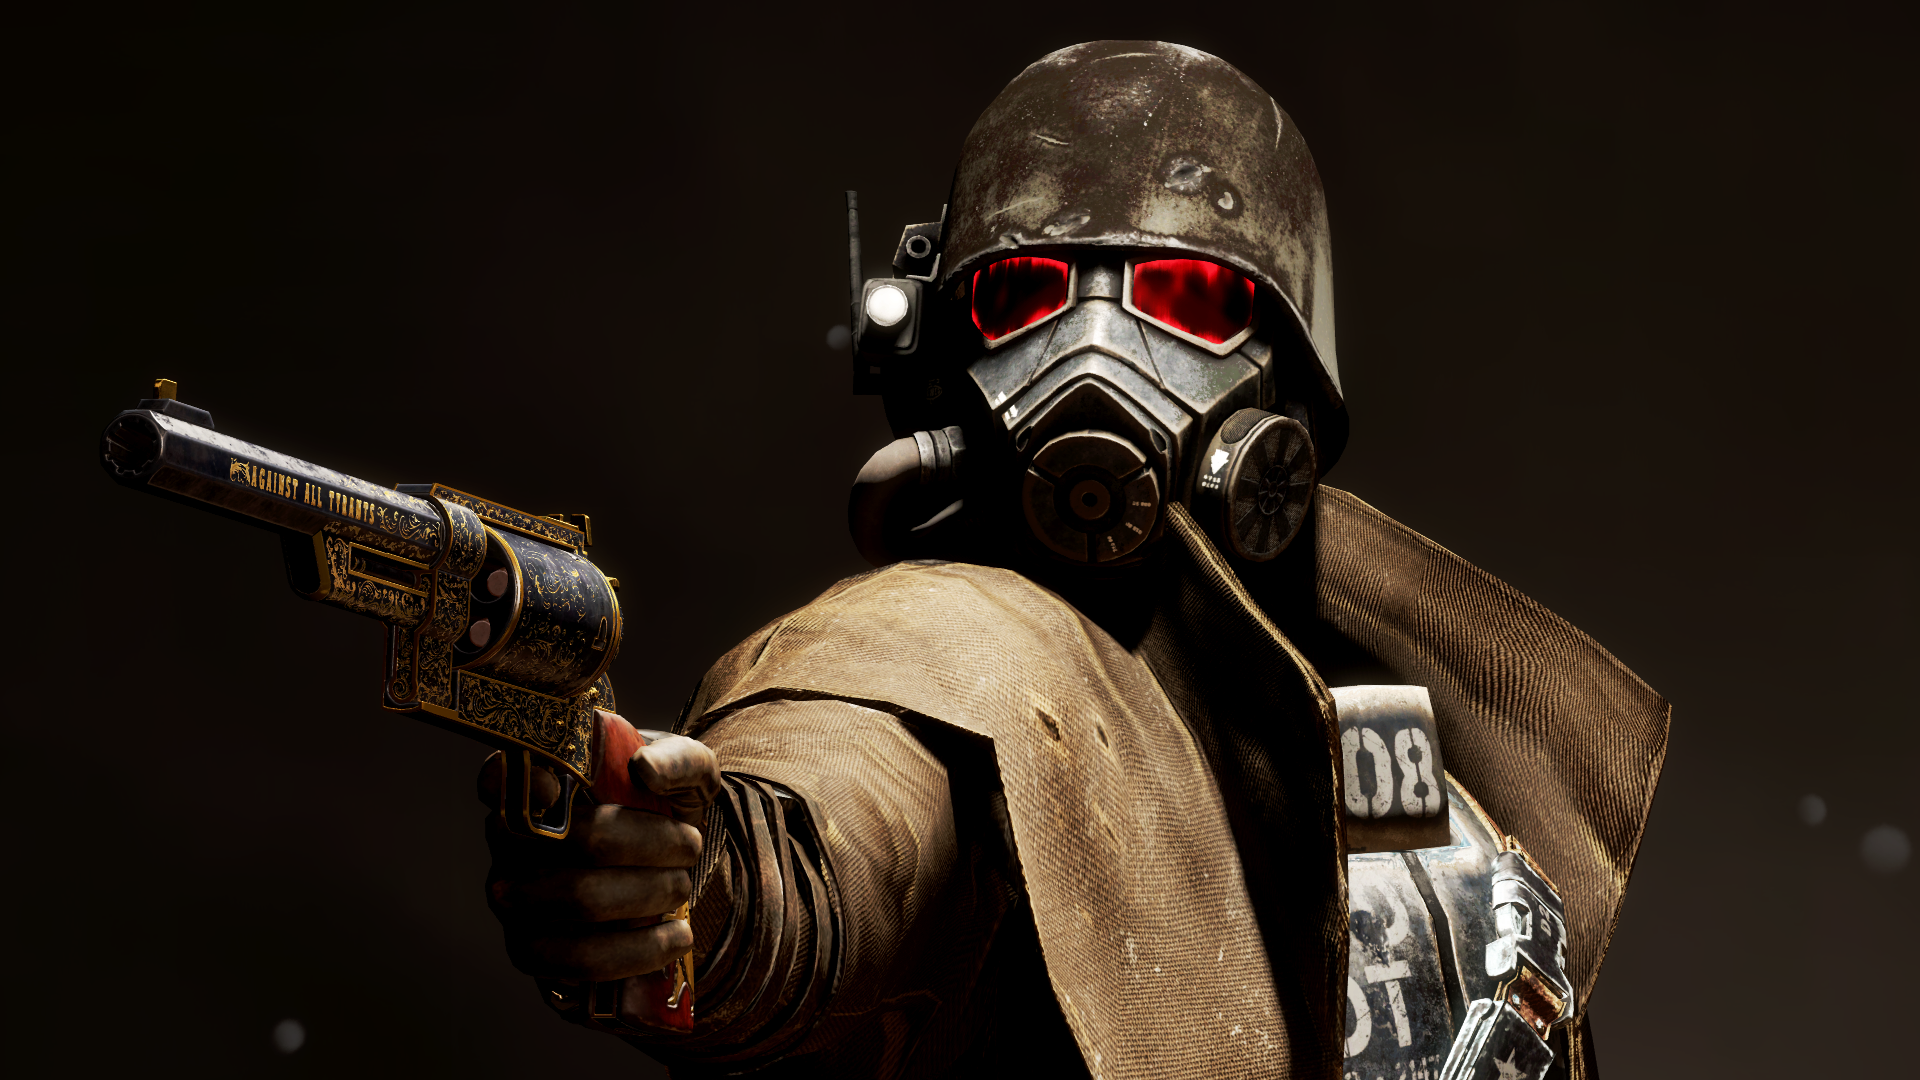 Fallout 4 Ncr Veteran Ranger Mod Packs Fallout New Vegas Armor